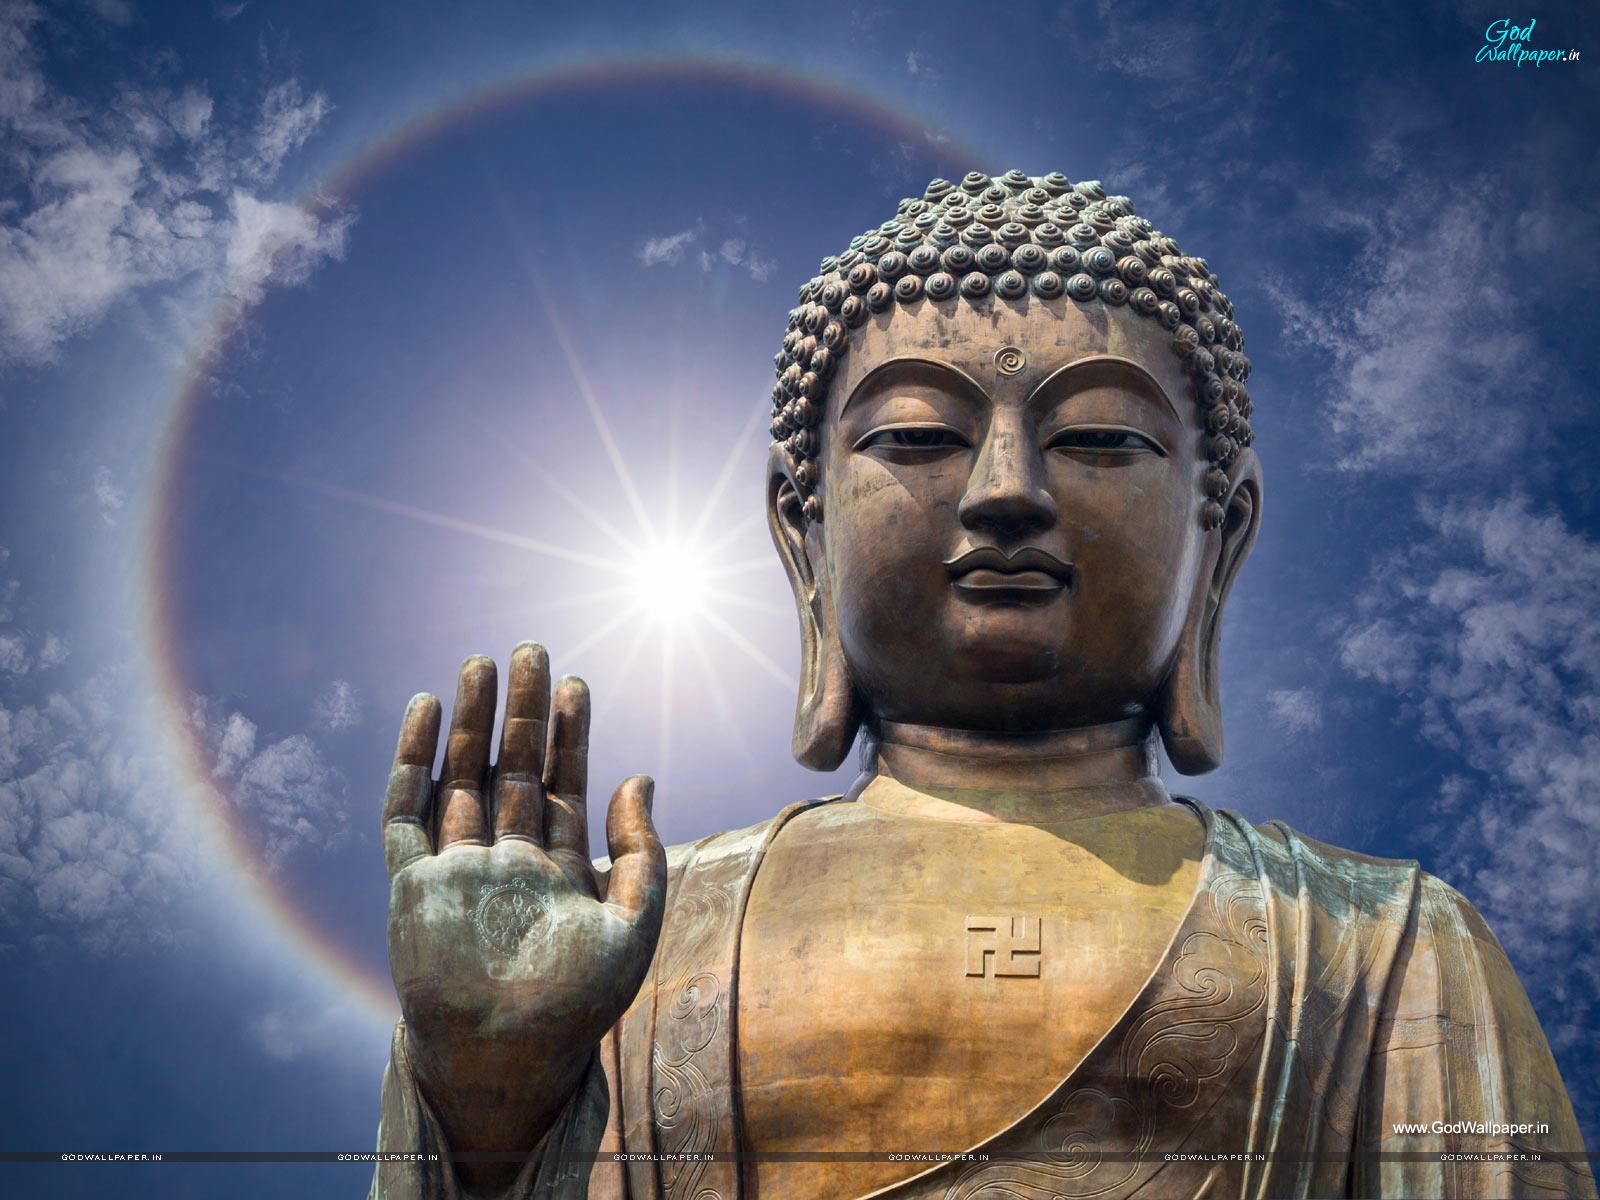 Images Hi Images Shayari Laughing Buddha Statue Hd Image: Buddhist Wallpapers And Screensavers